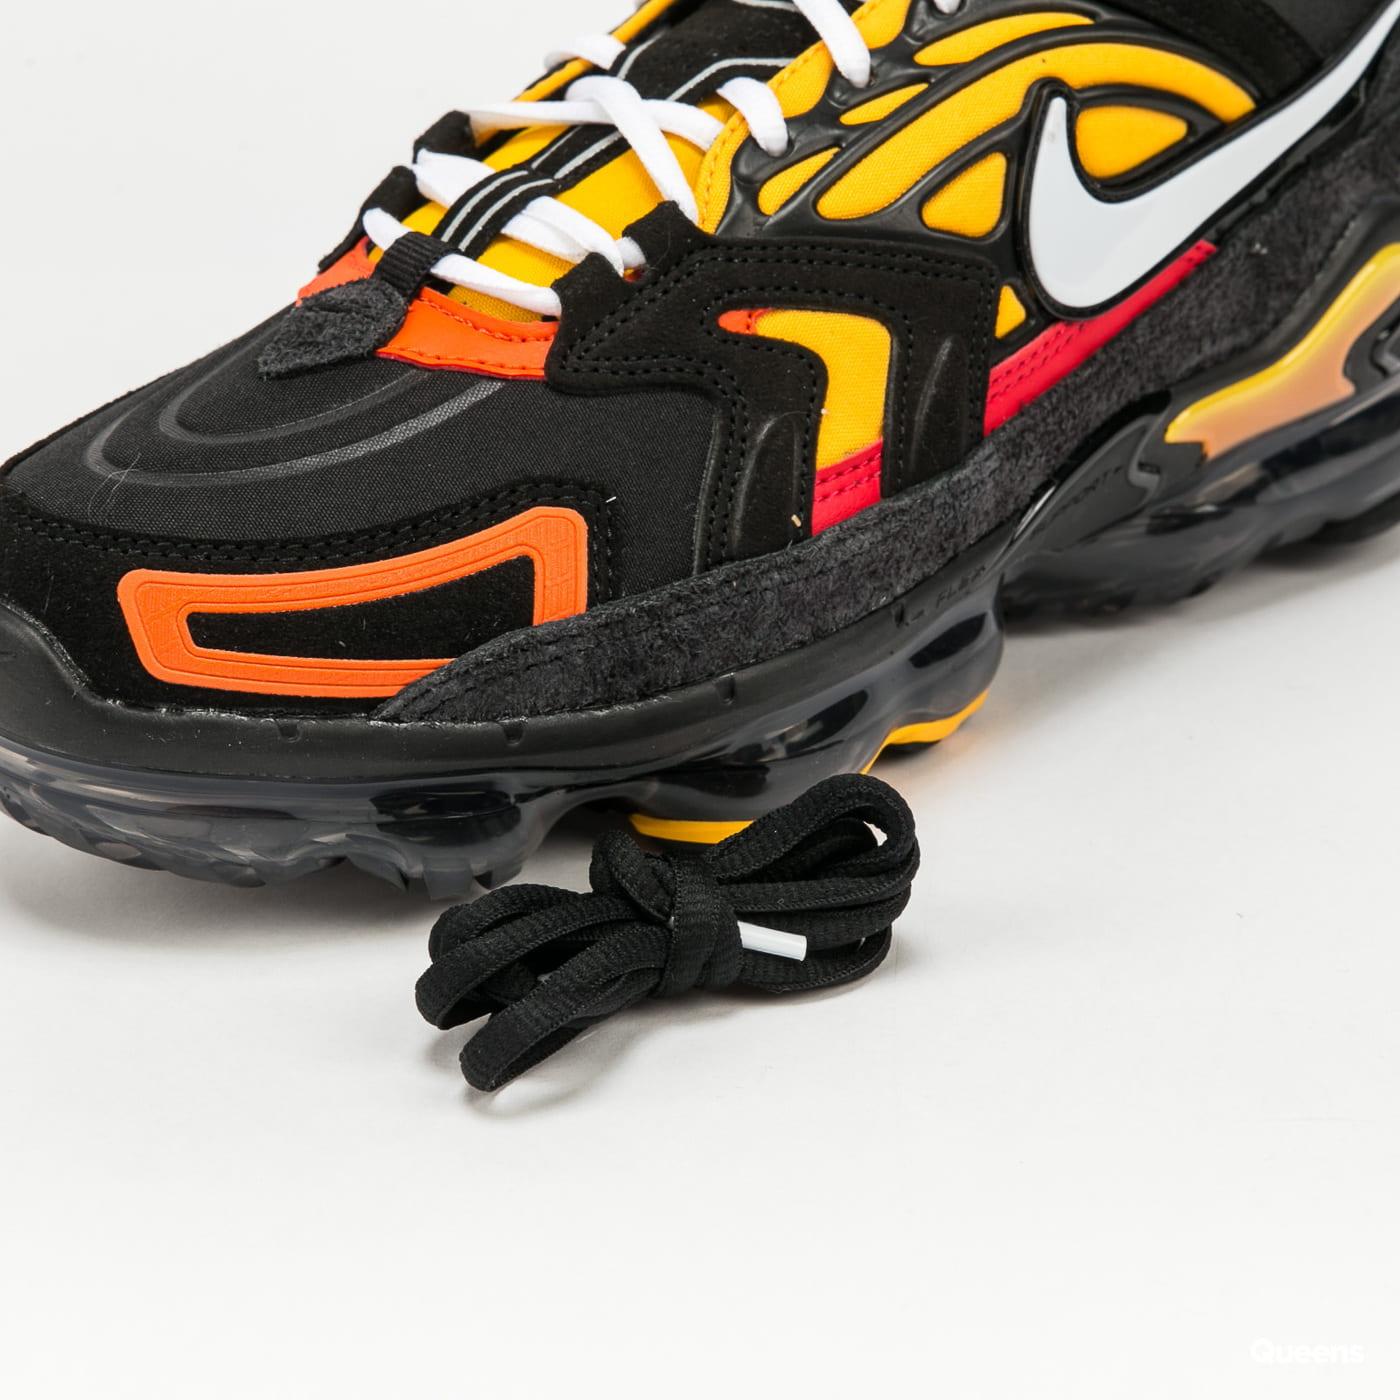 Nike Air Vapormax Evo SE black / white - orange